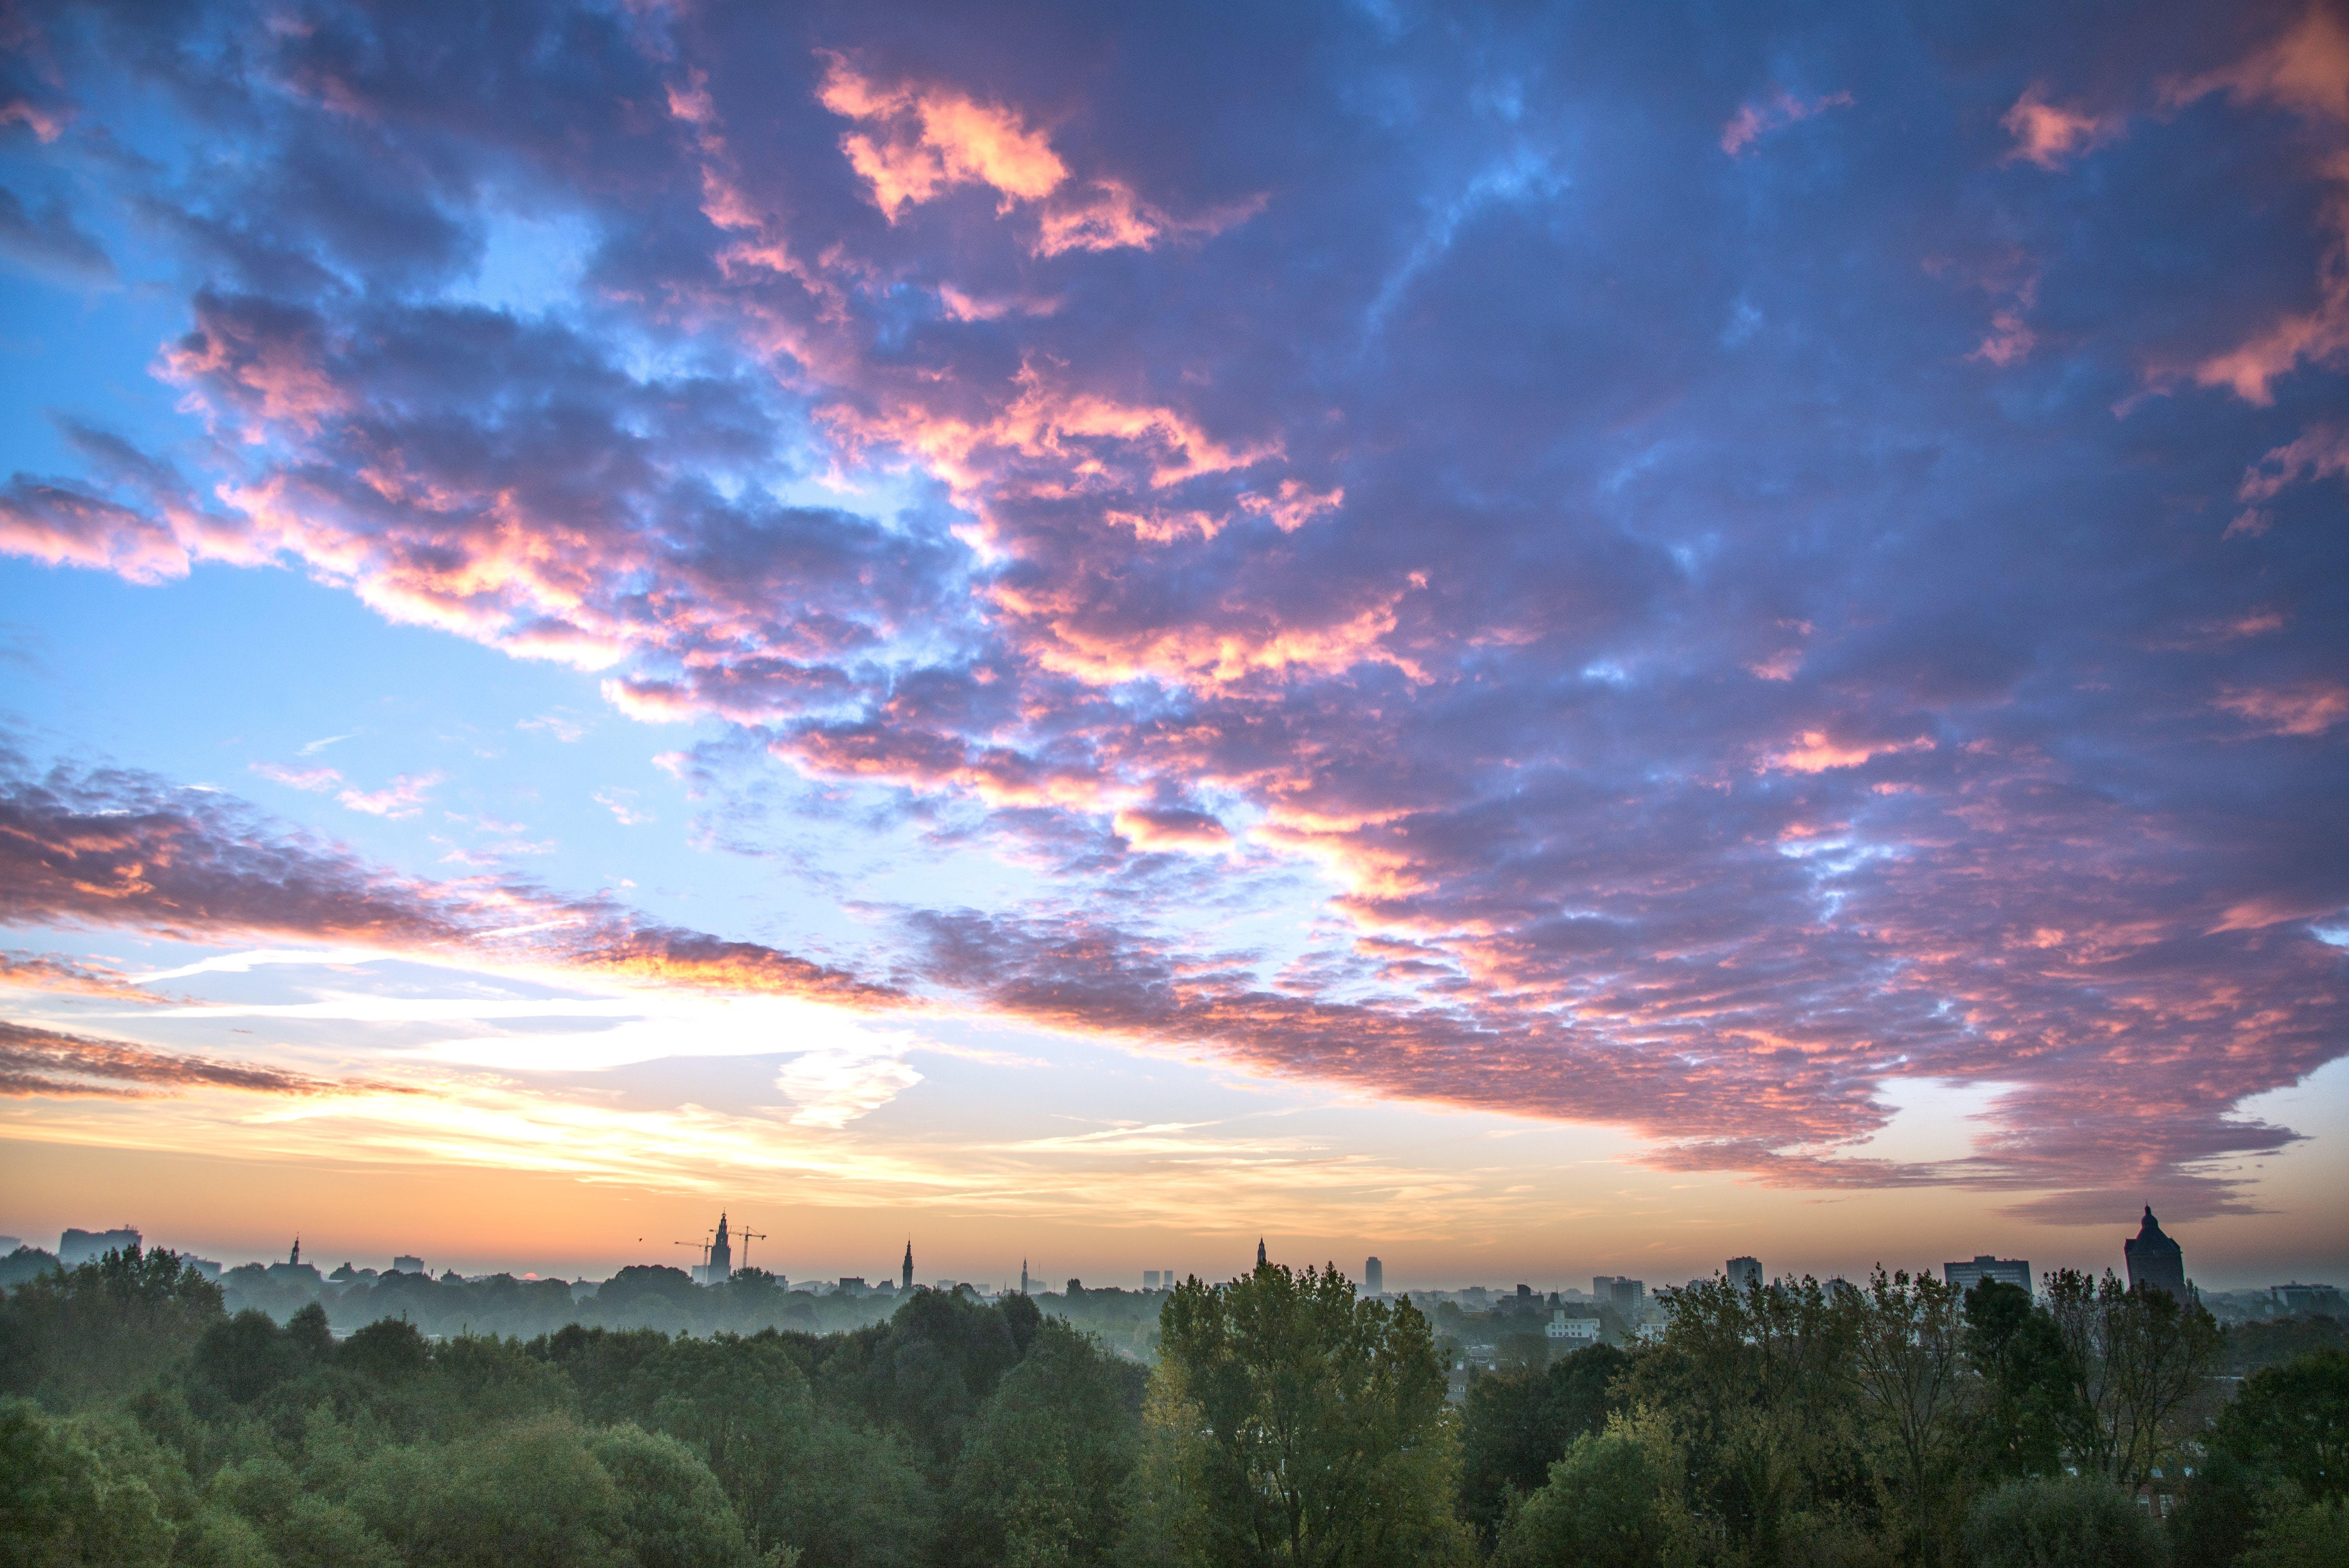 Free stock photo of city, clouds, sunrise, fog